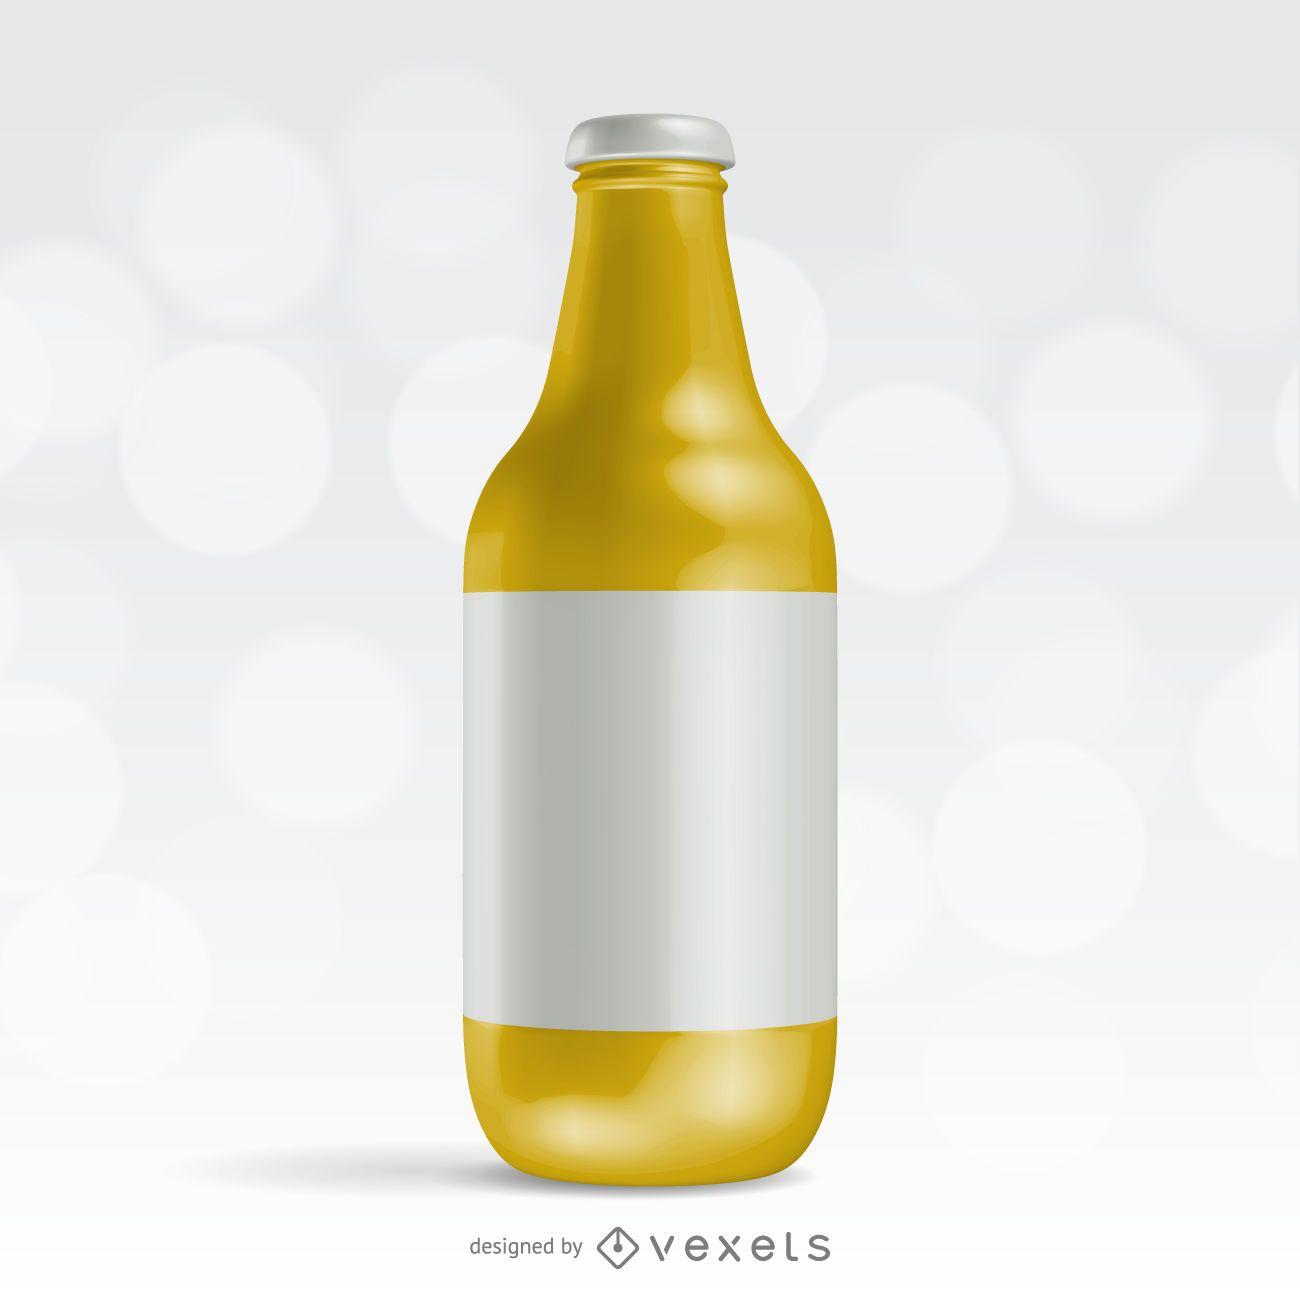 Realistic bottle packaging design